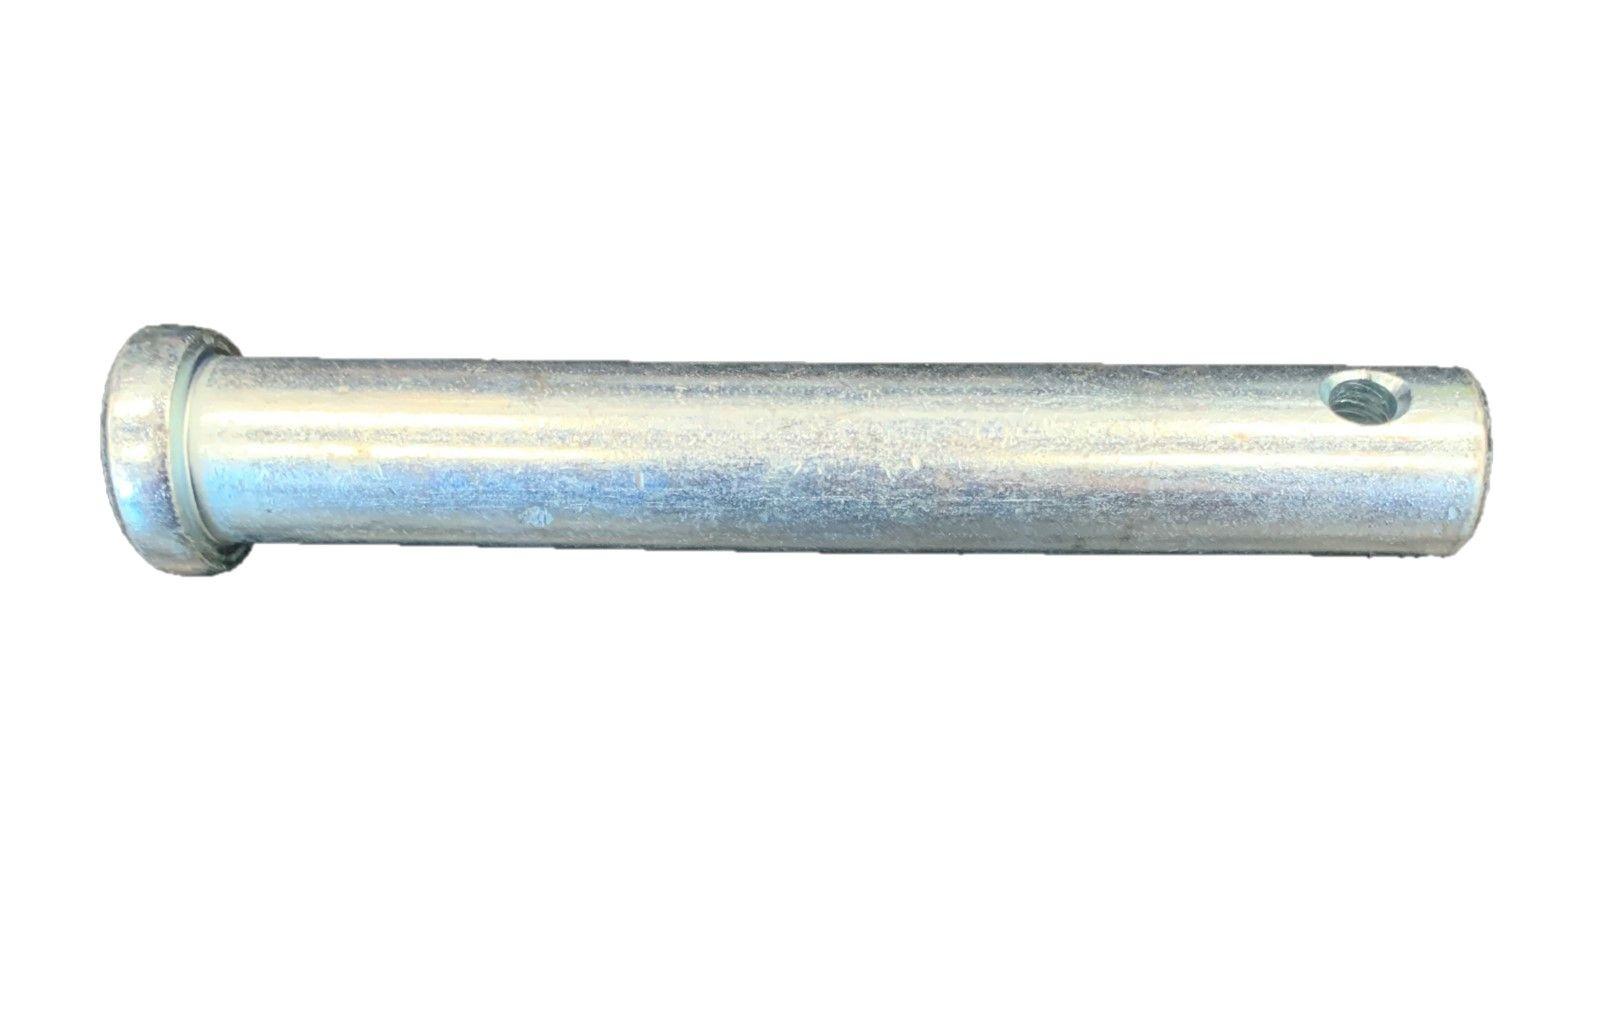 SnowEx Clevis Pin 3/4x5.00 HT